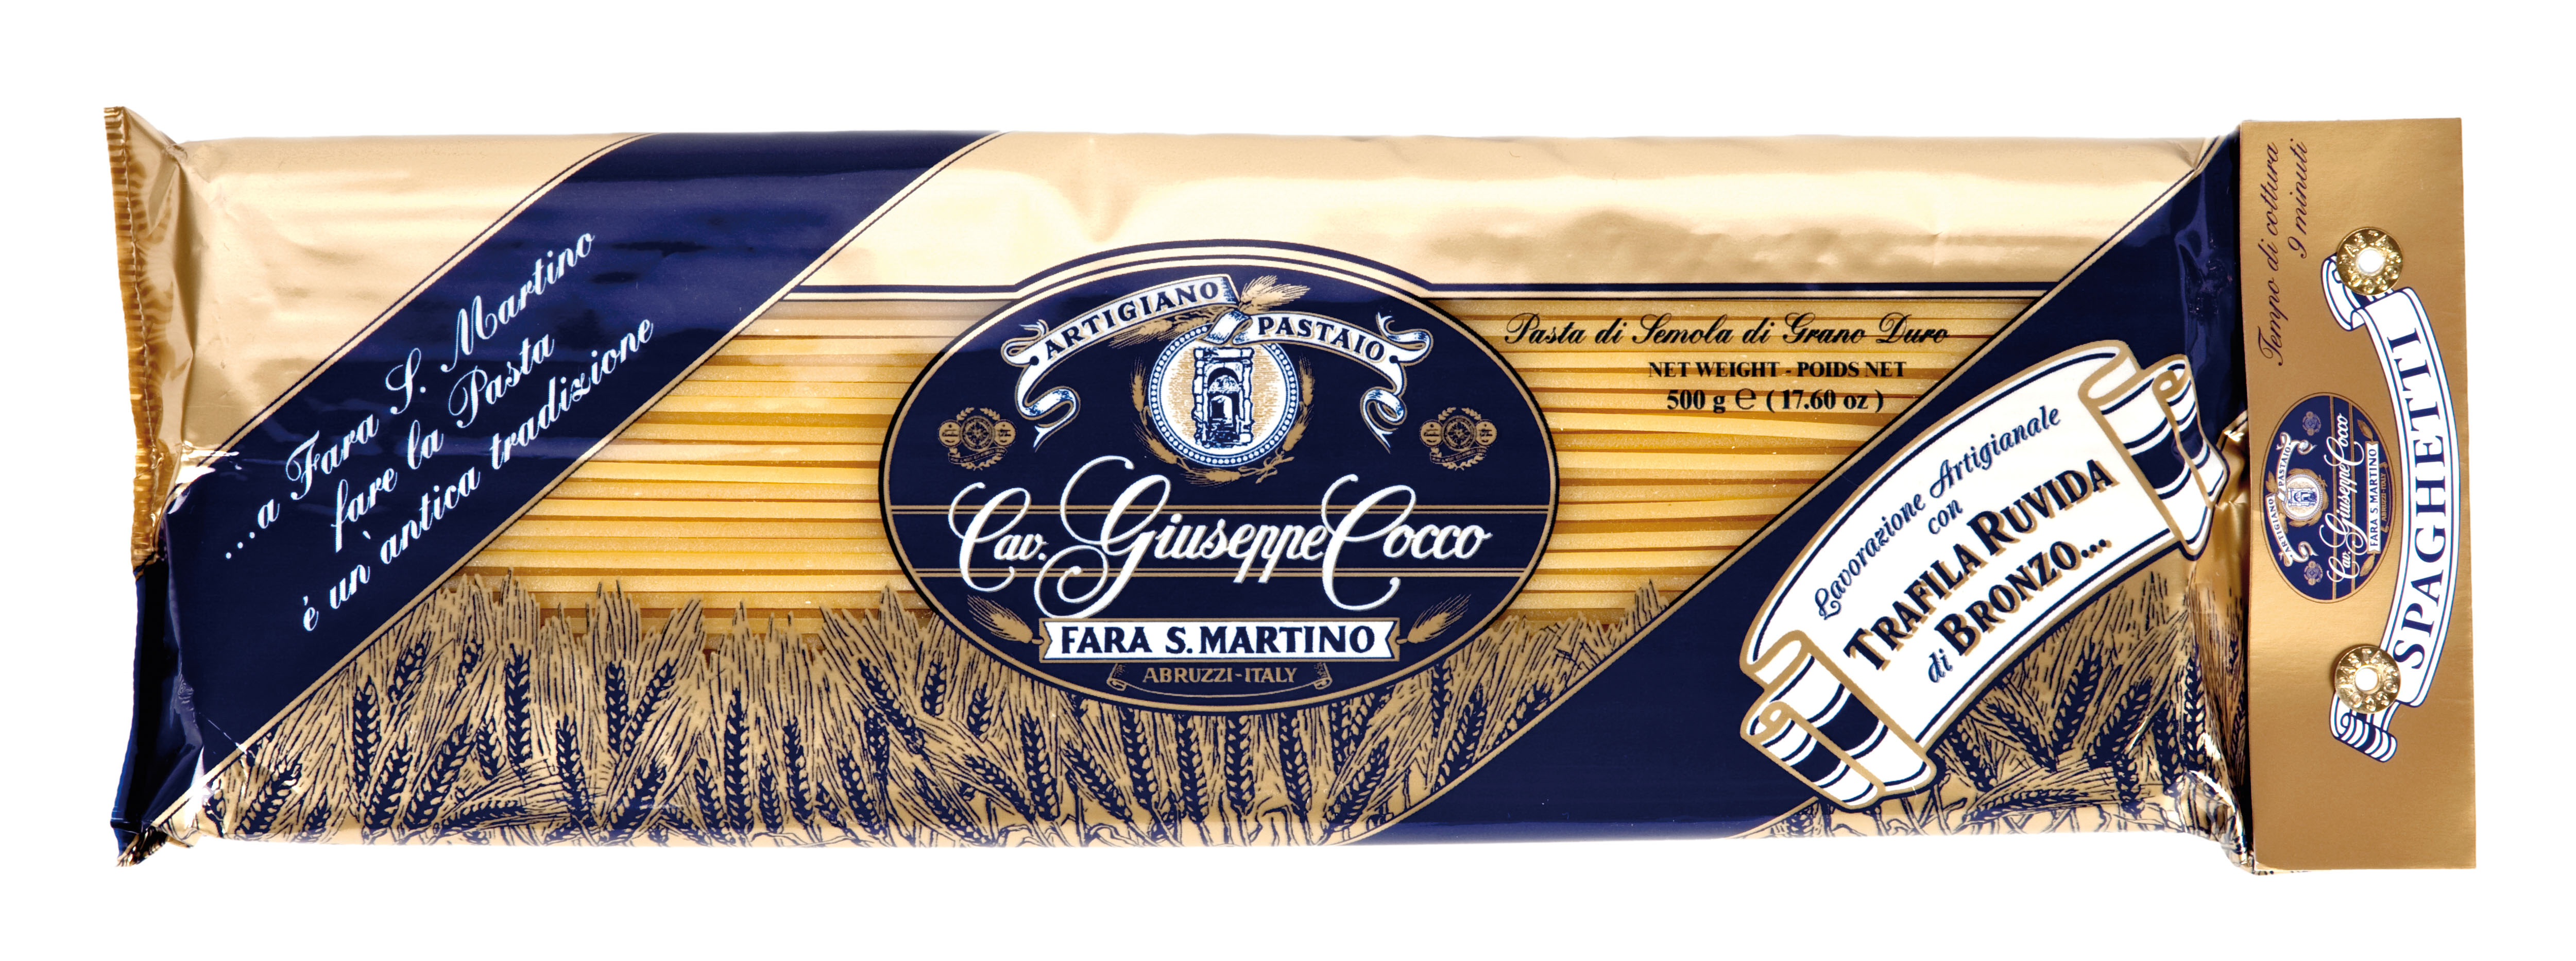 Spaghetti Nr. 33 500 g Packung Cocco